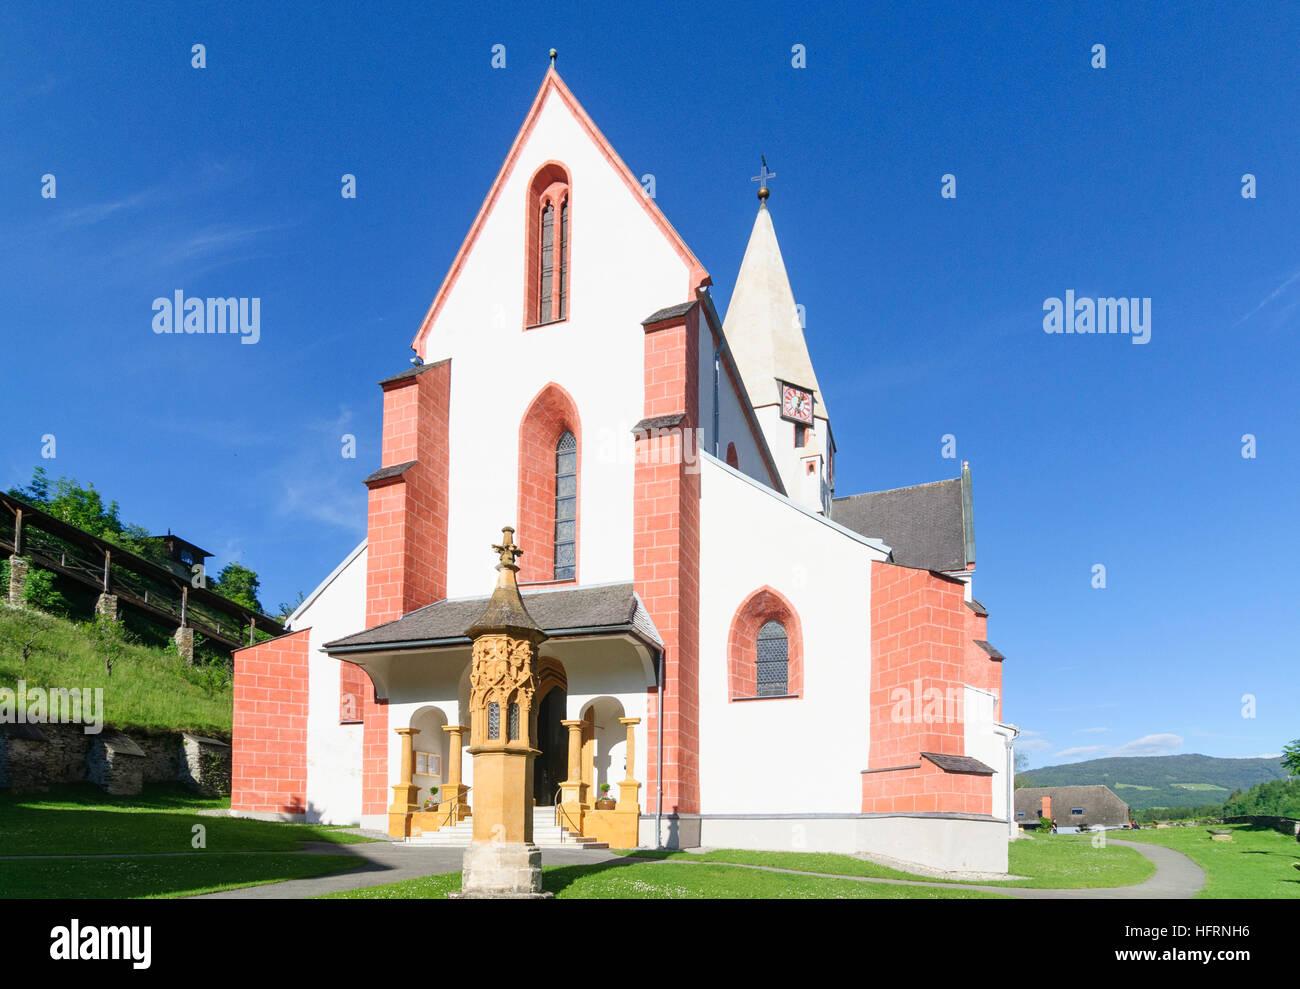 Murau: St. Matthäus parish church and gothic light column, Murtal, Steiermark, Styria, Austria Stock Photo